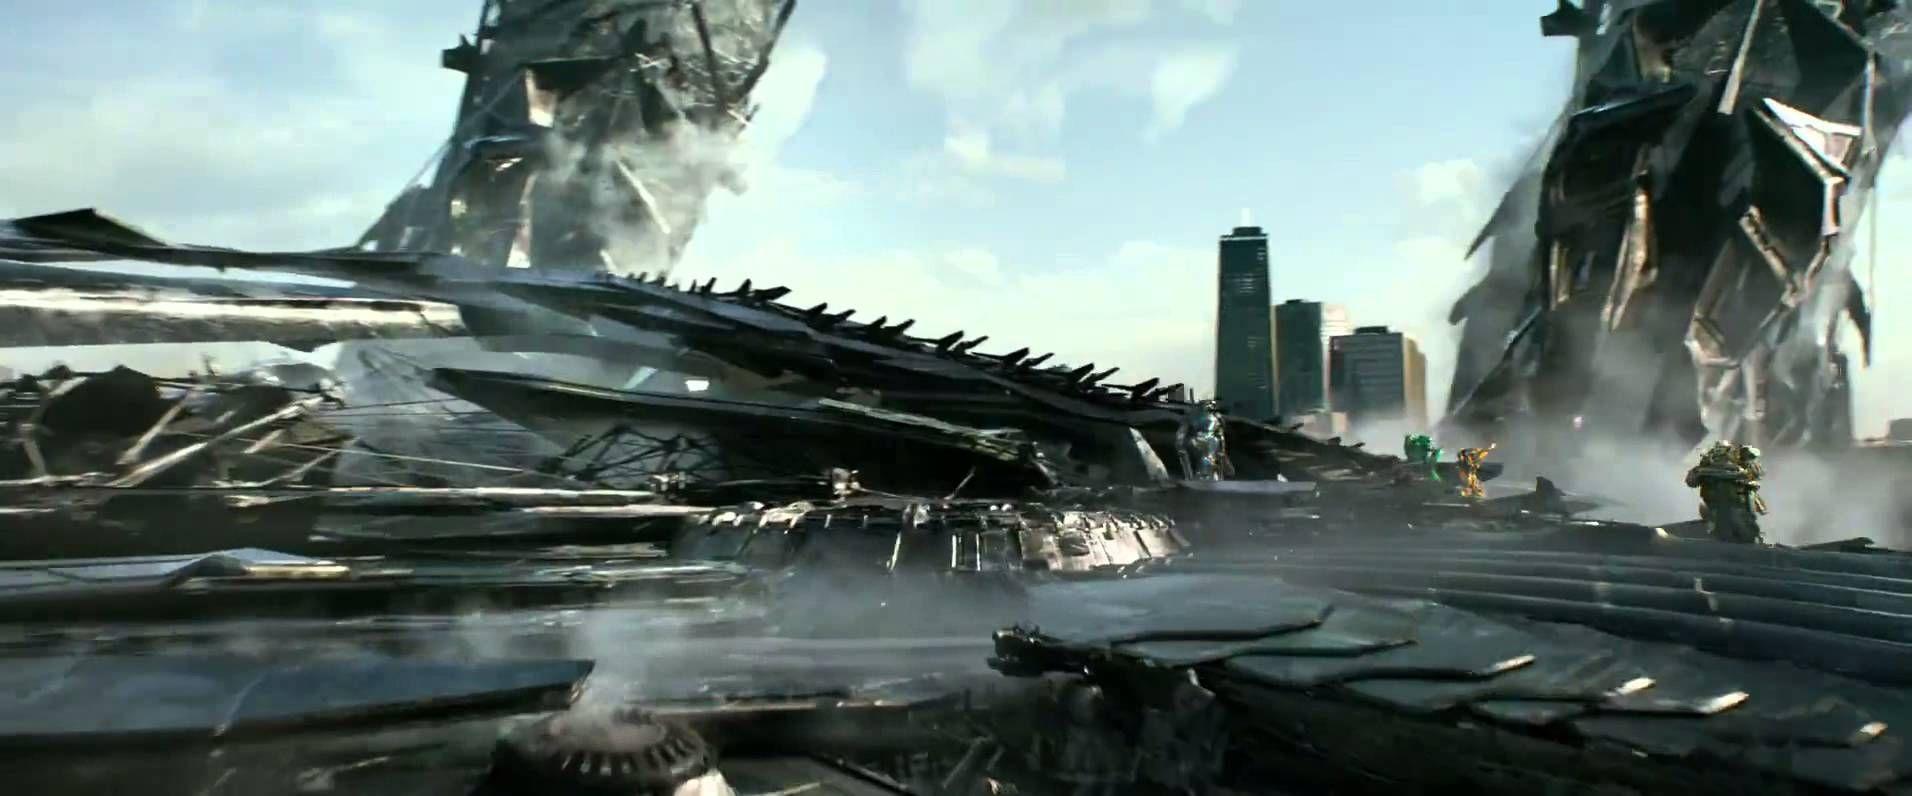 transformers 4 age of extinction - lockdown ship scene hd | cool